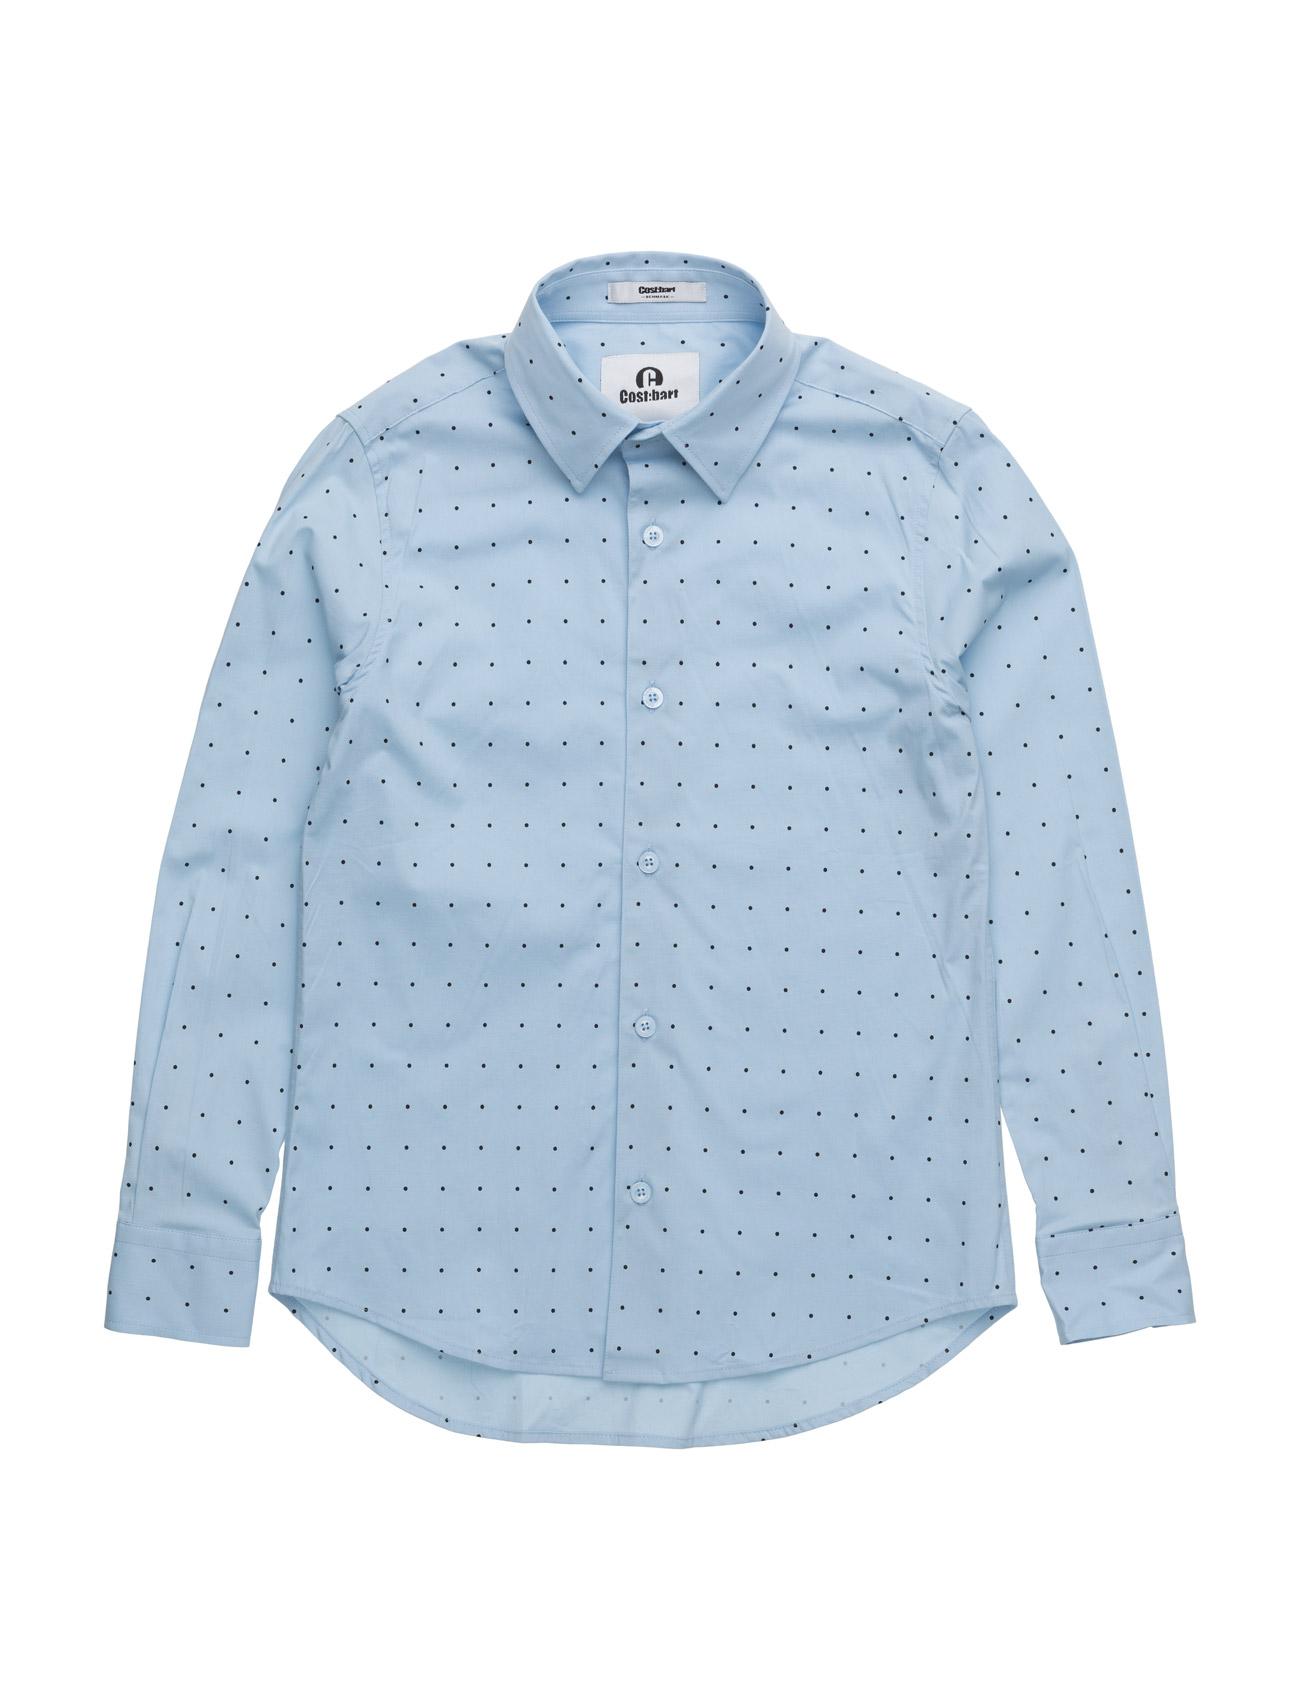 Kaiser Shirt CostBart  til Børn i Hvid